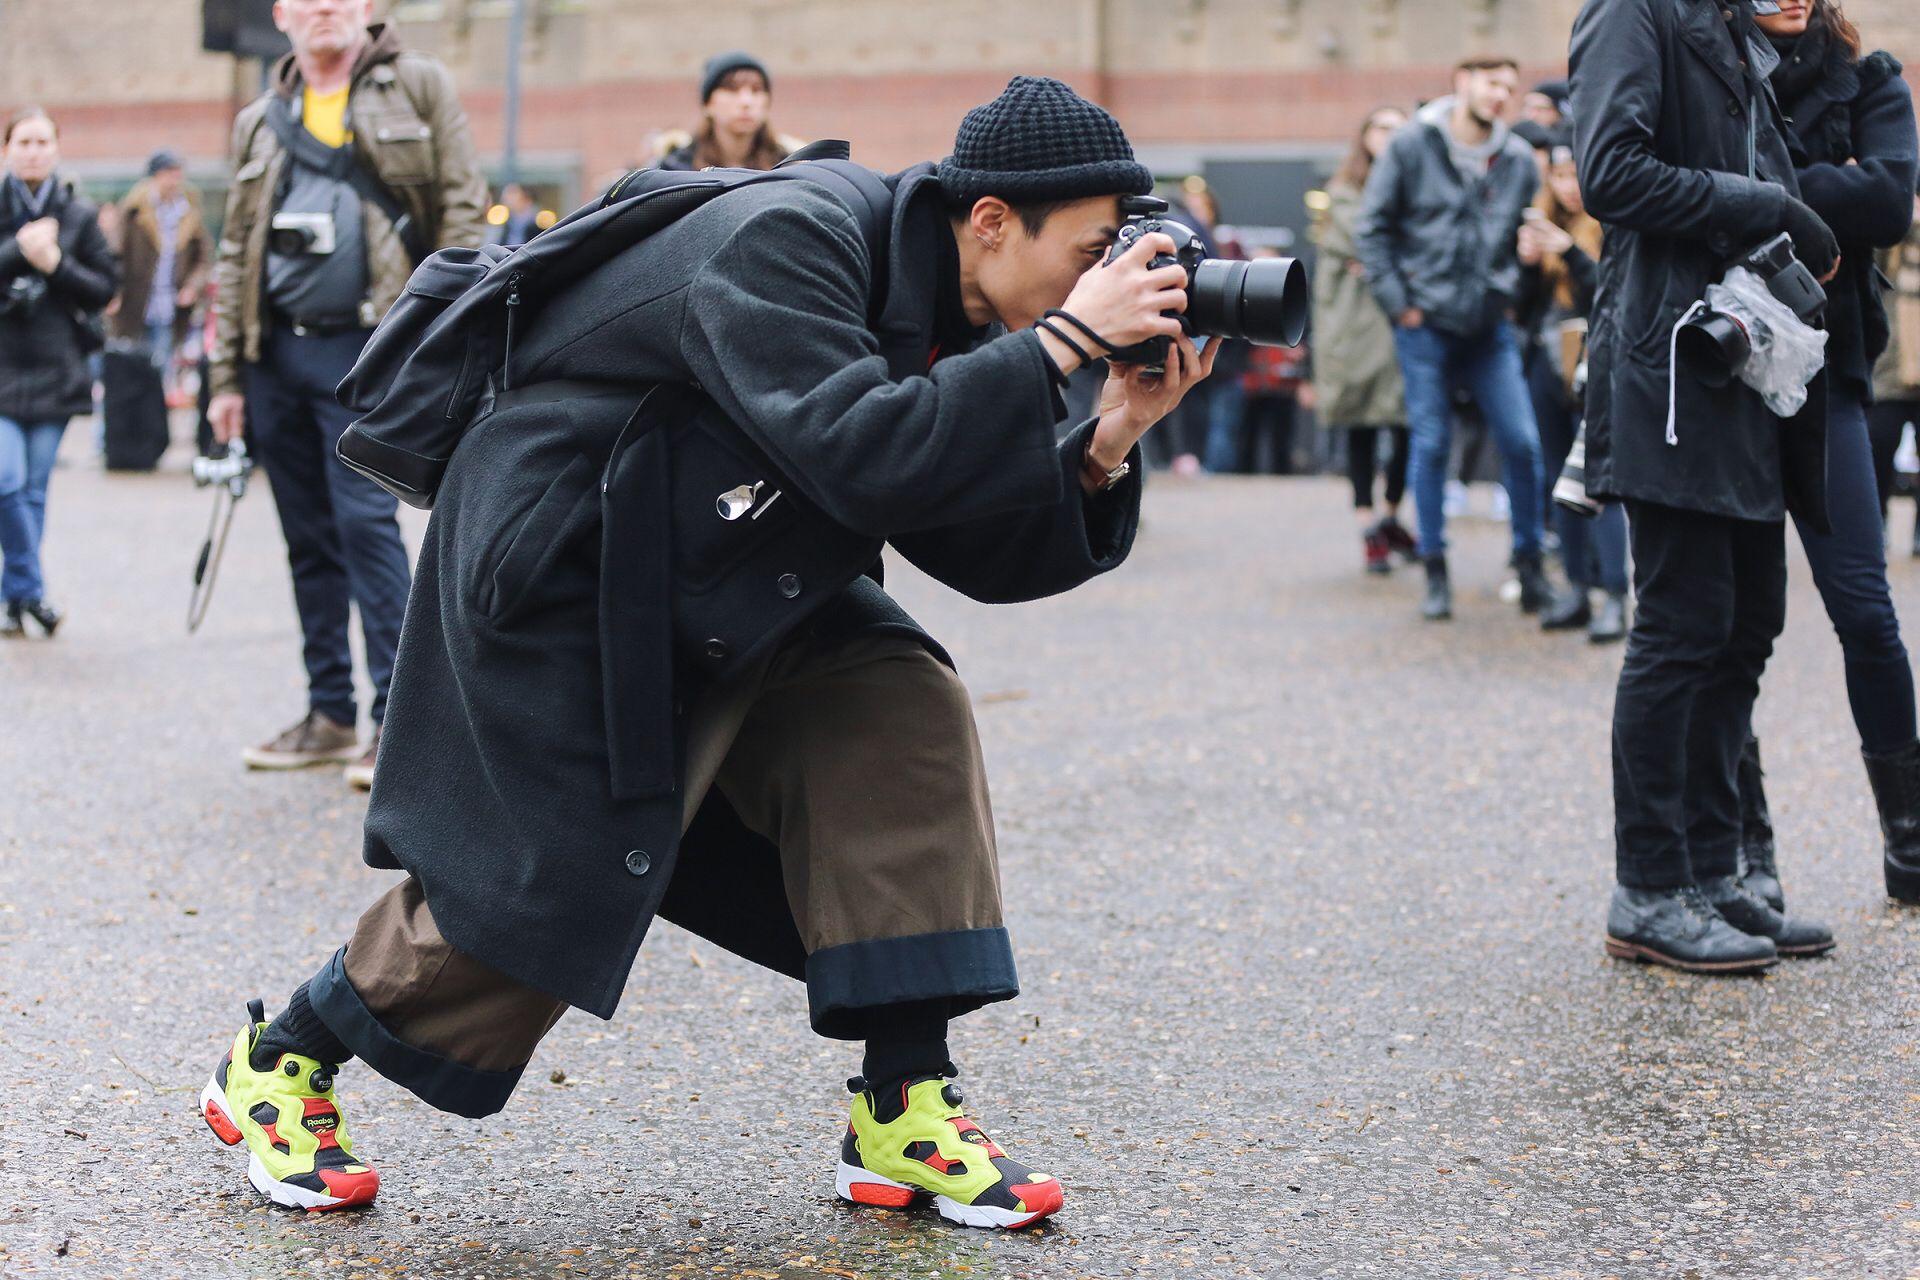 timeless design 4e1c3 ce198 Andrea Marigonda in the Reebok Insta Pump Fury OG   fashion   Reebok pump  fury, Reebok, Fashion